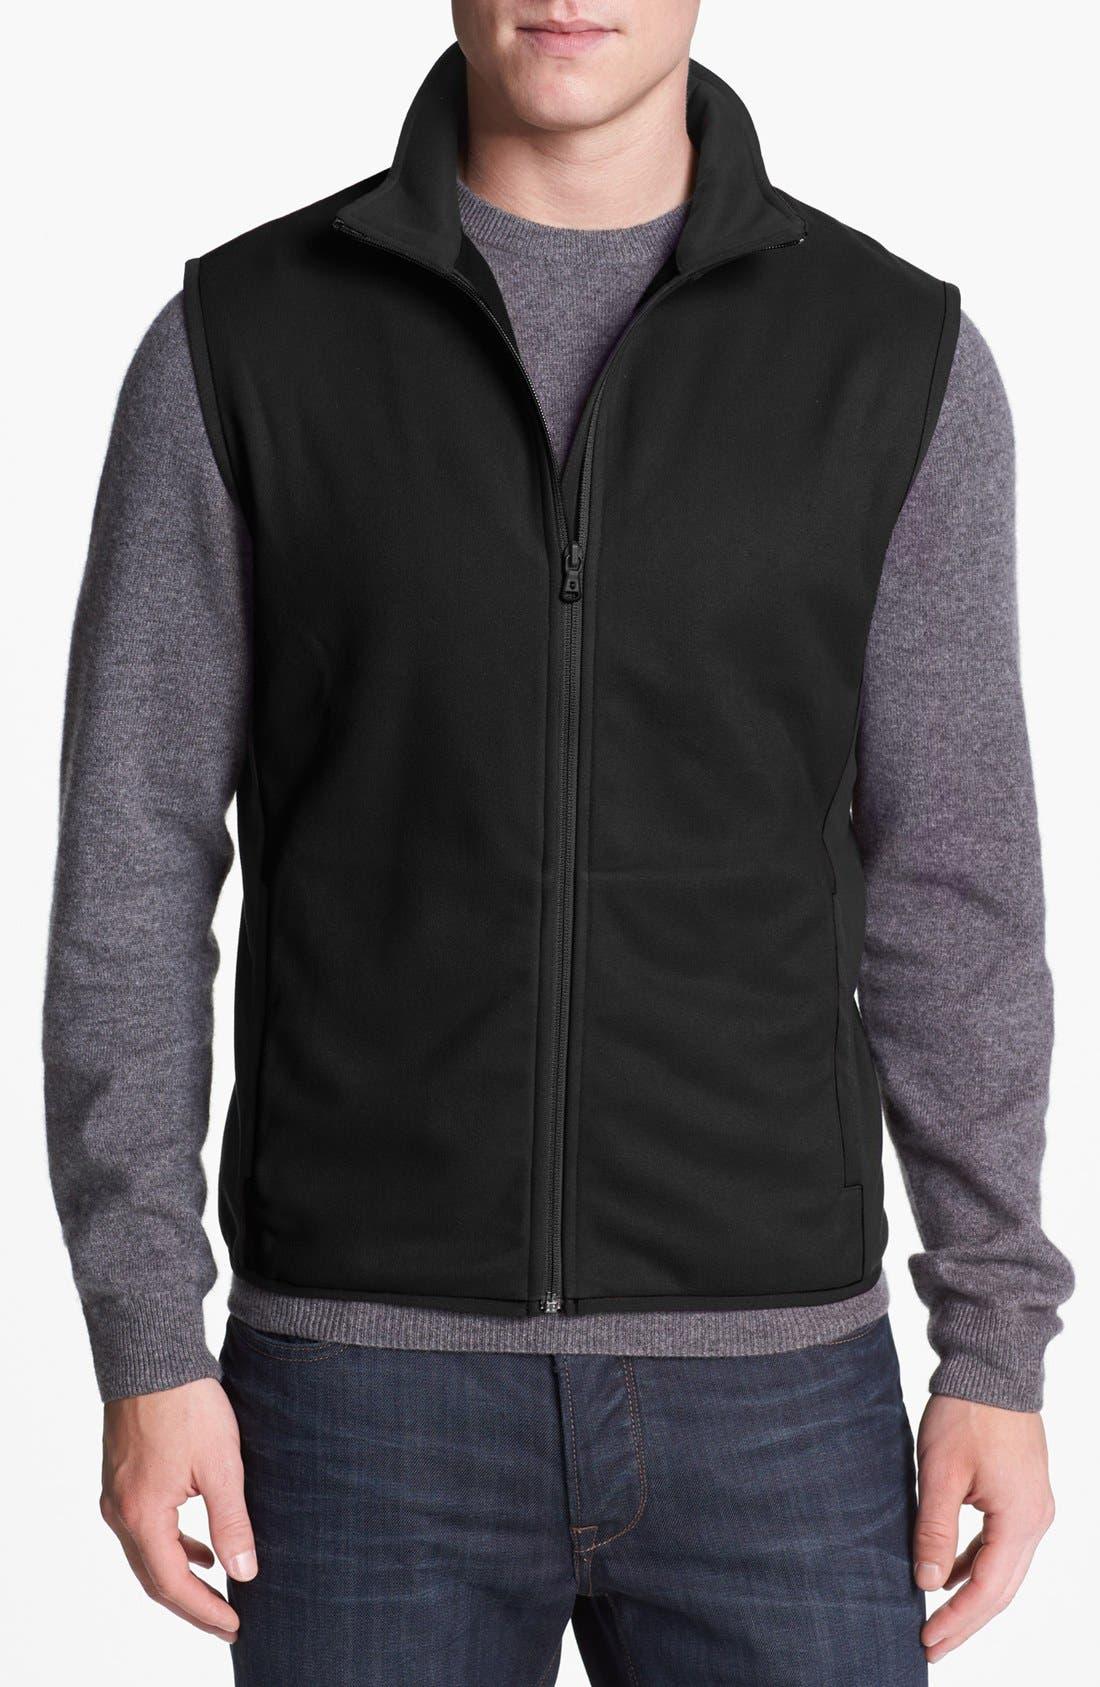 Alternate Image 1 Selected - Victorinox Swiss Army® 'Matterhorn' Fleece Vest